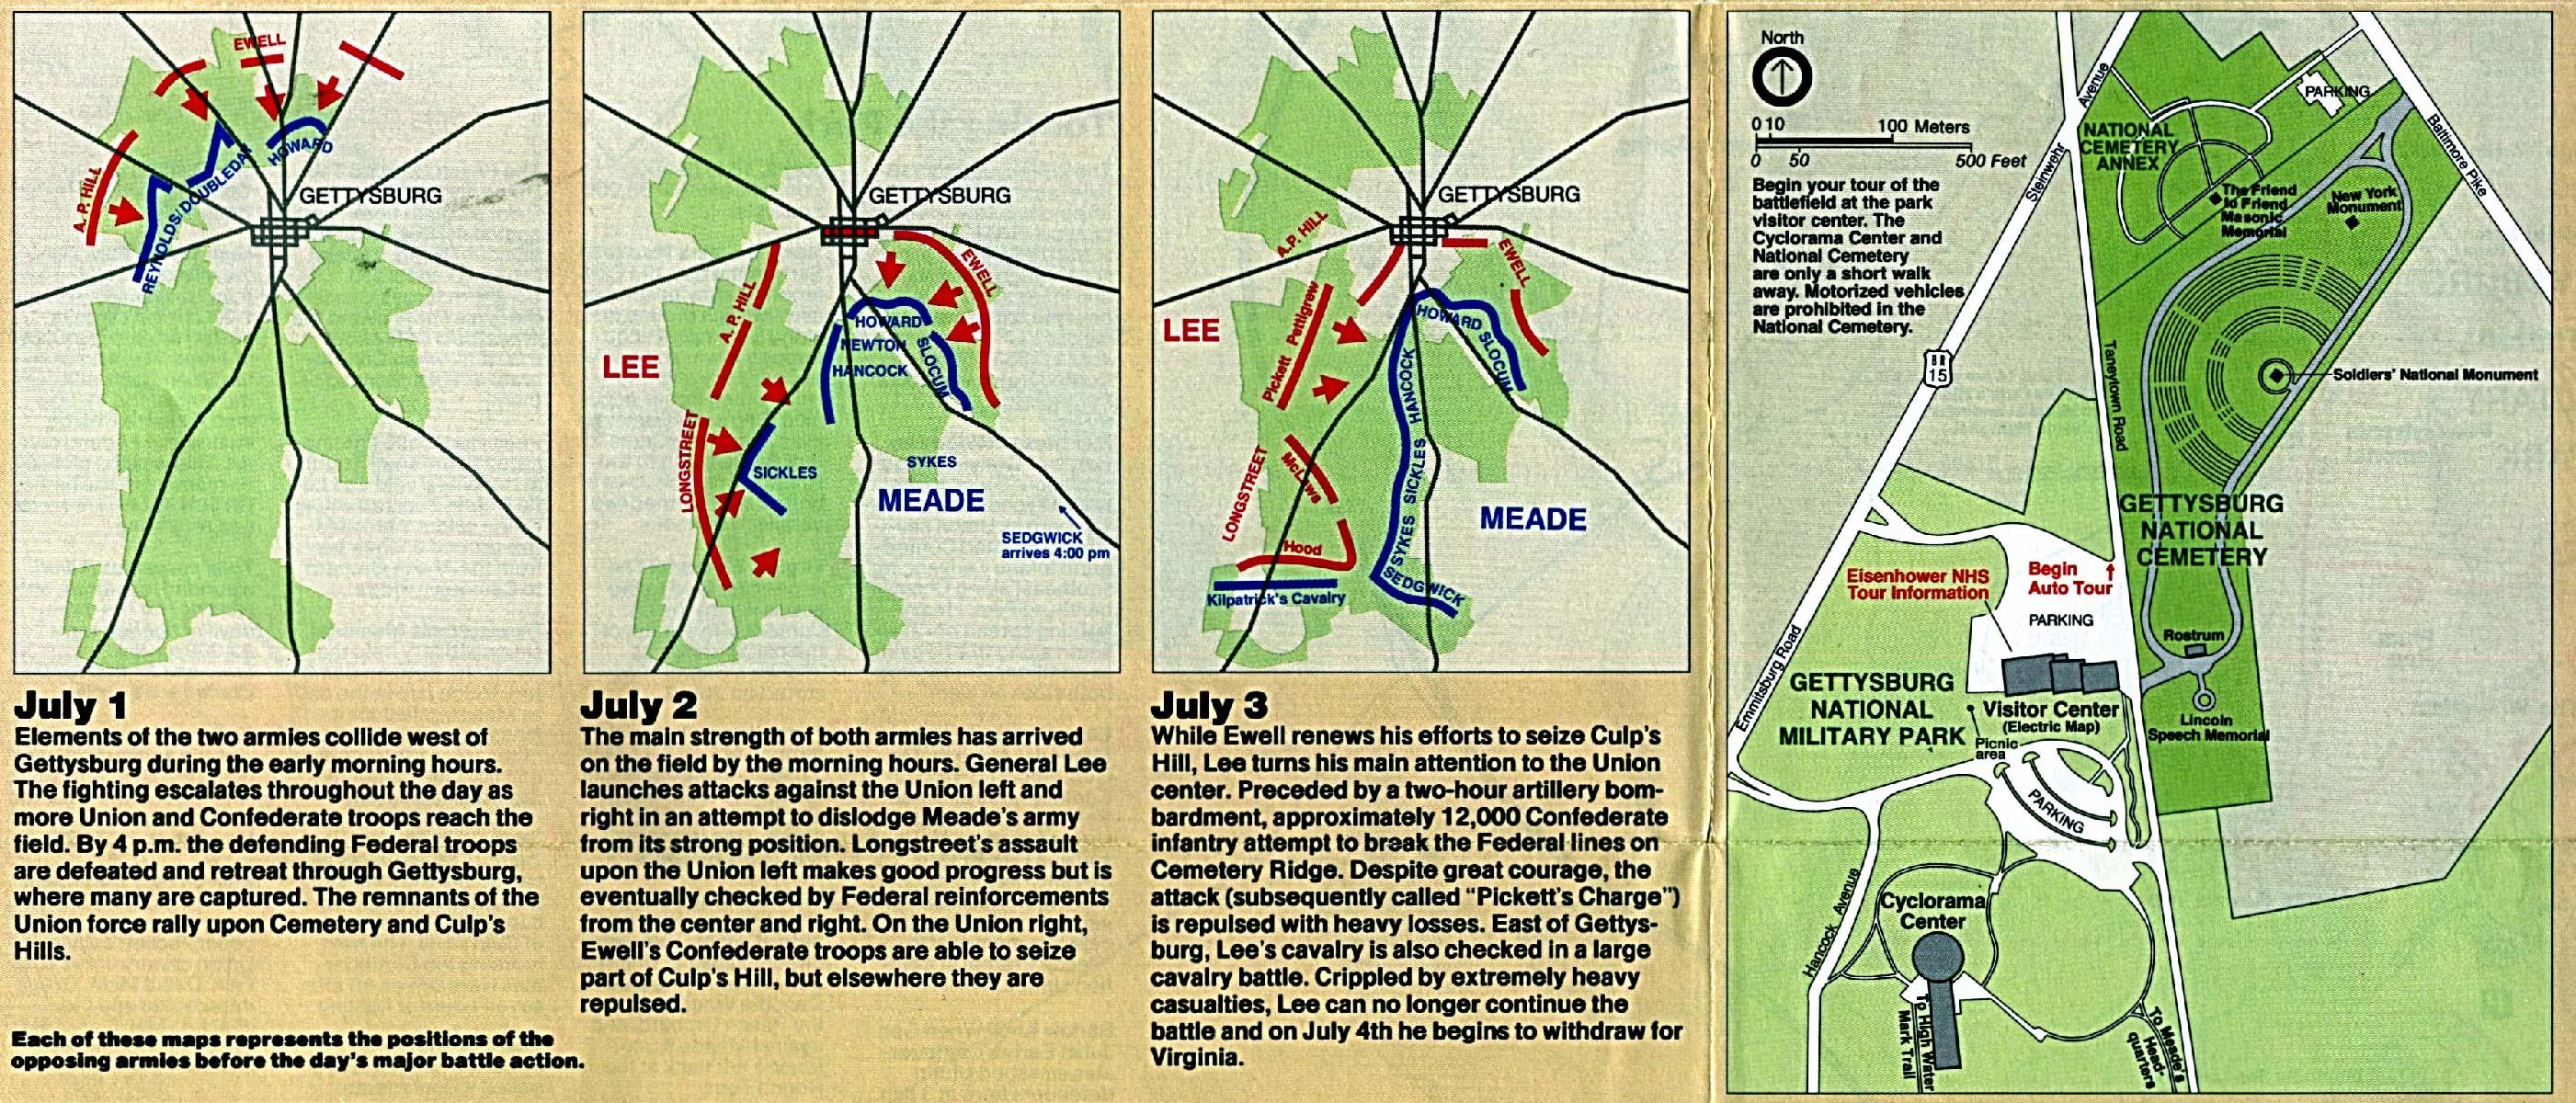 Free Download Pennsylvania National Park Maps - Battle of gettysburg map us